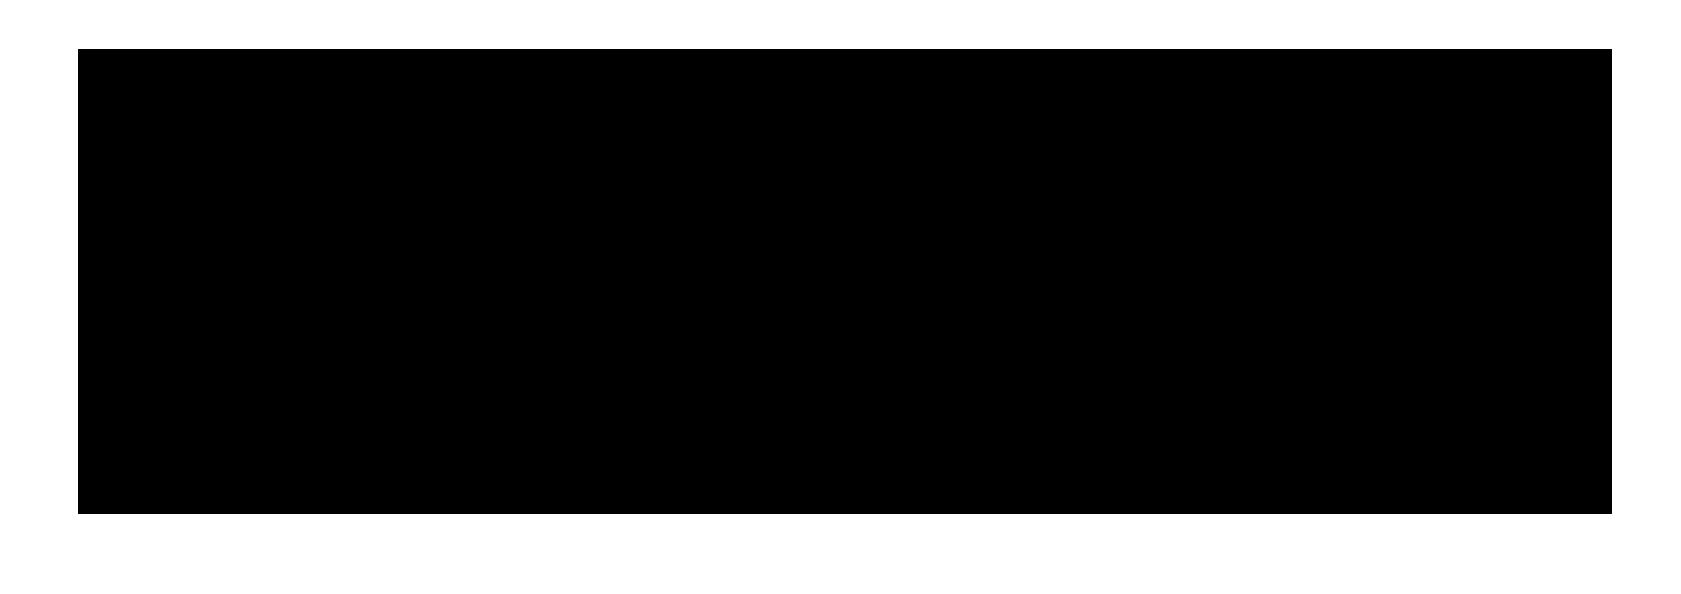 BR_Group_logo